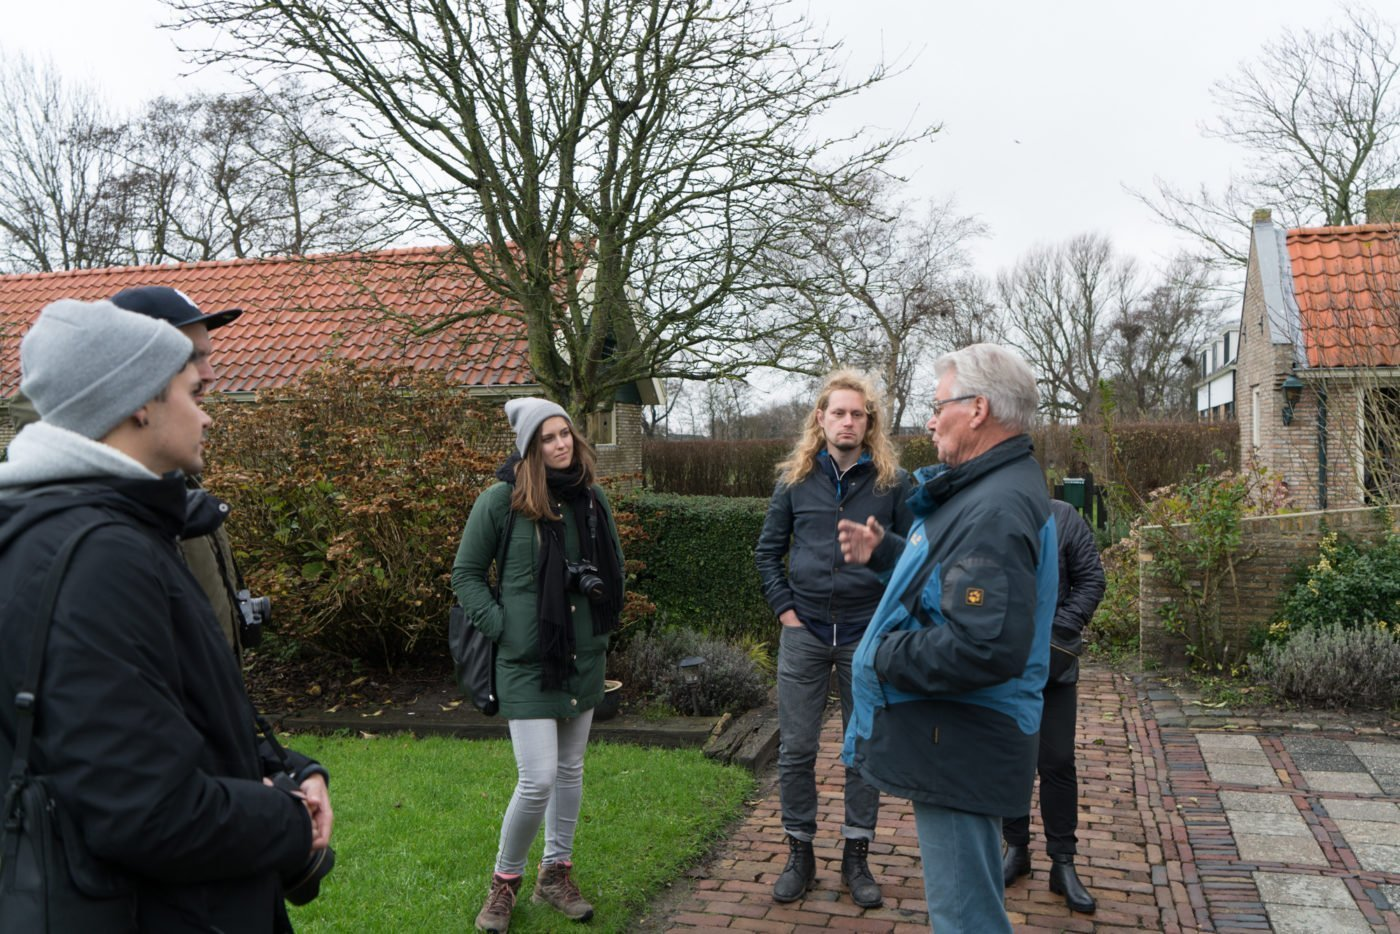 Guided walking tour in Schiermonnikoog